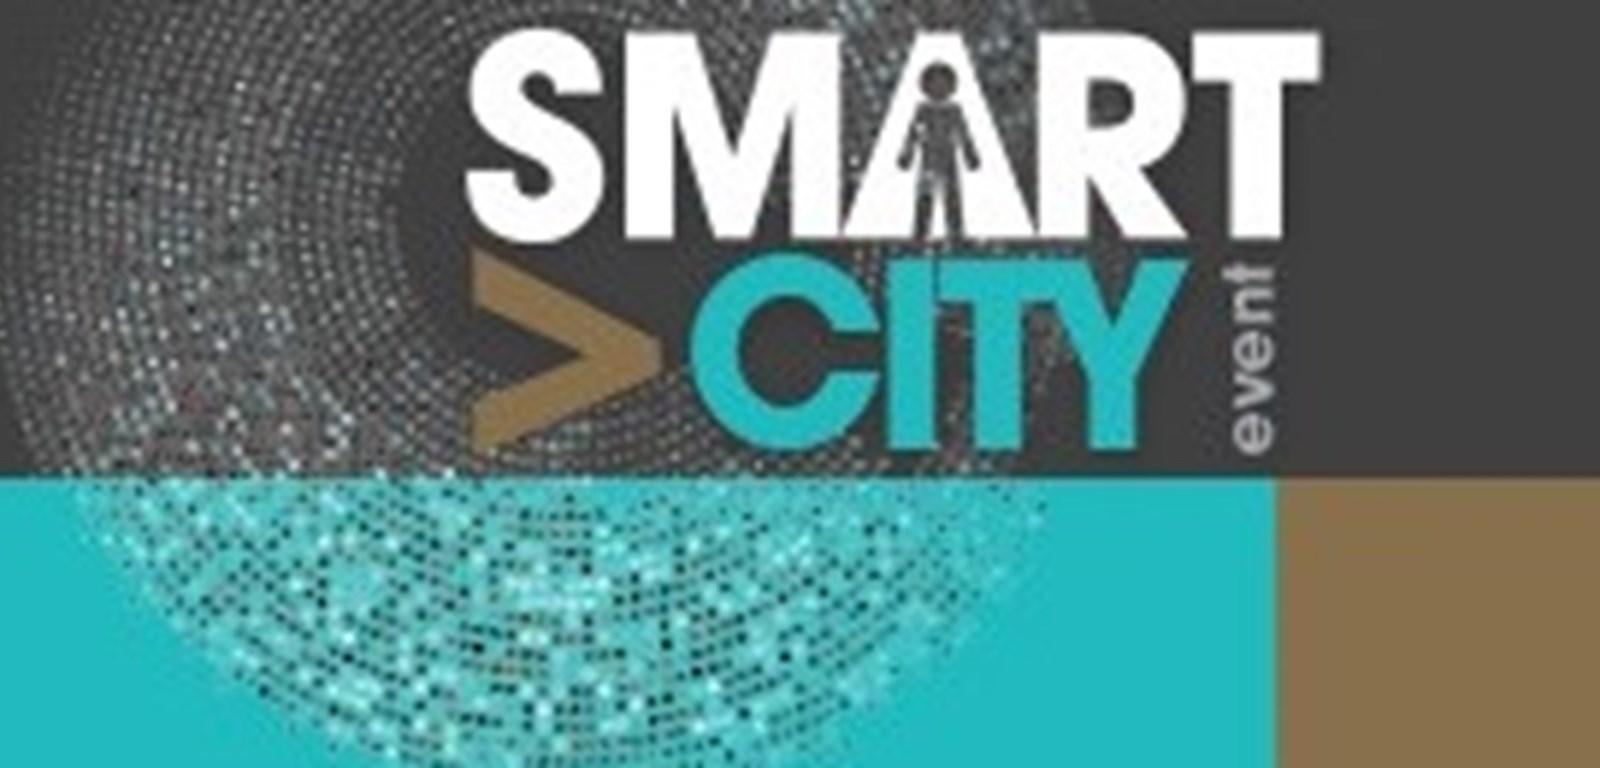 Smart City Event